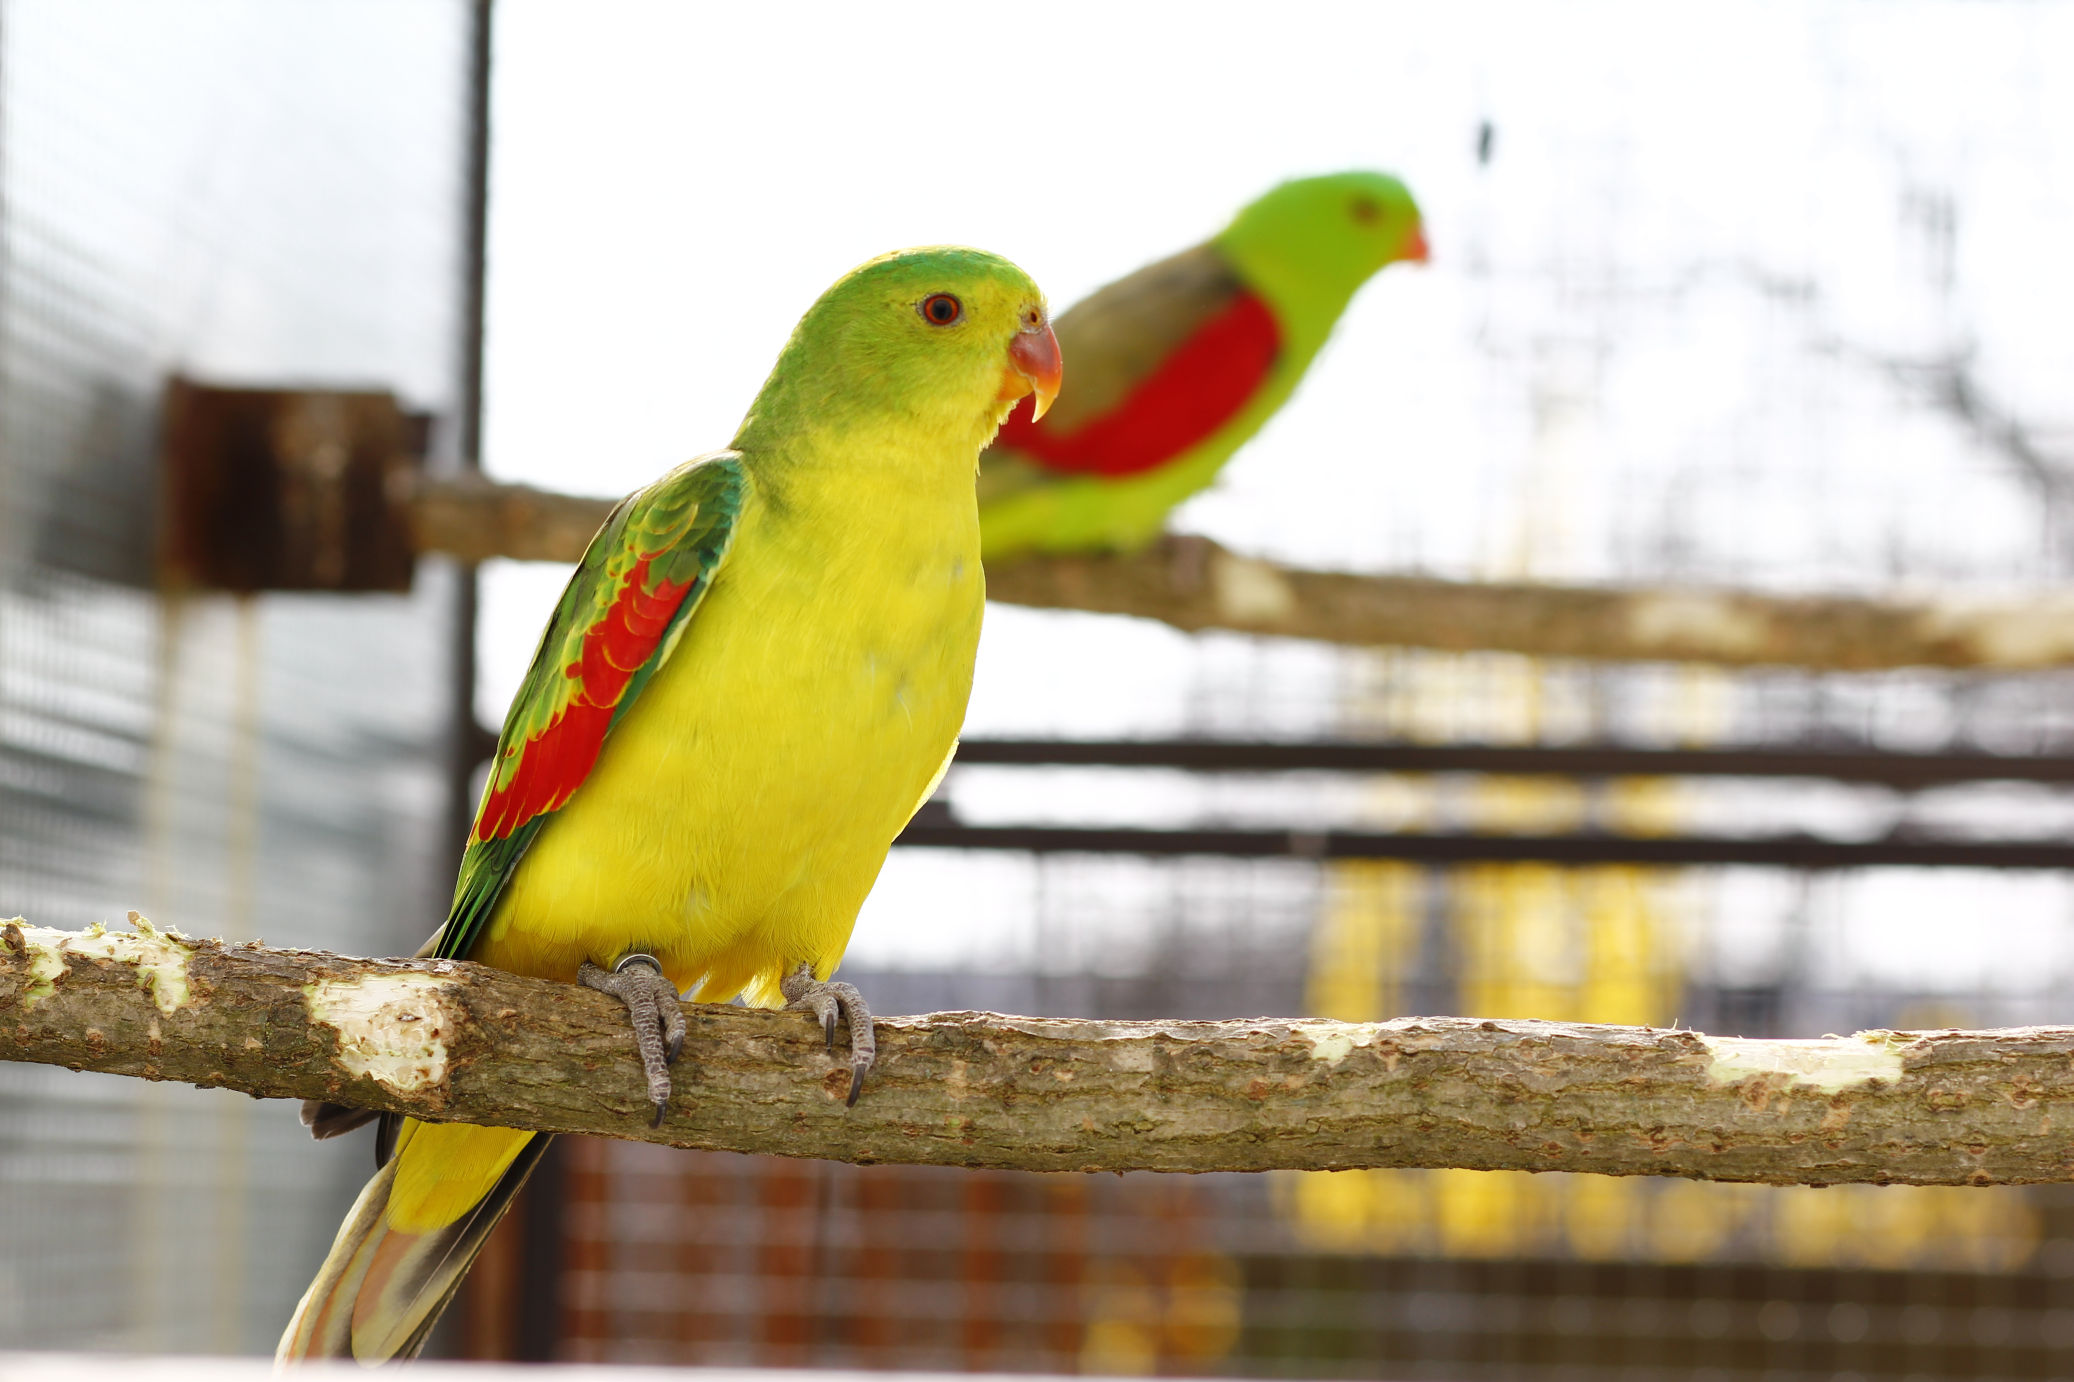 papousek_cervenokridly_007.jpg